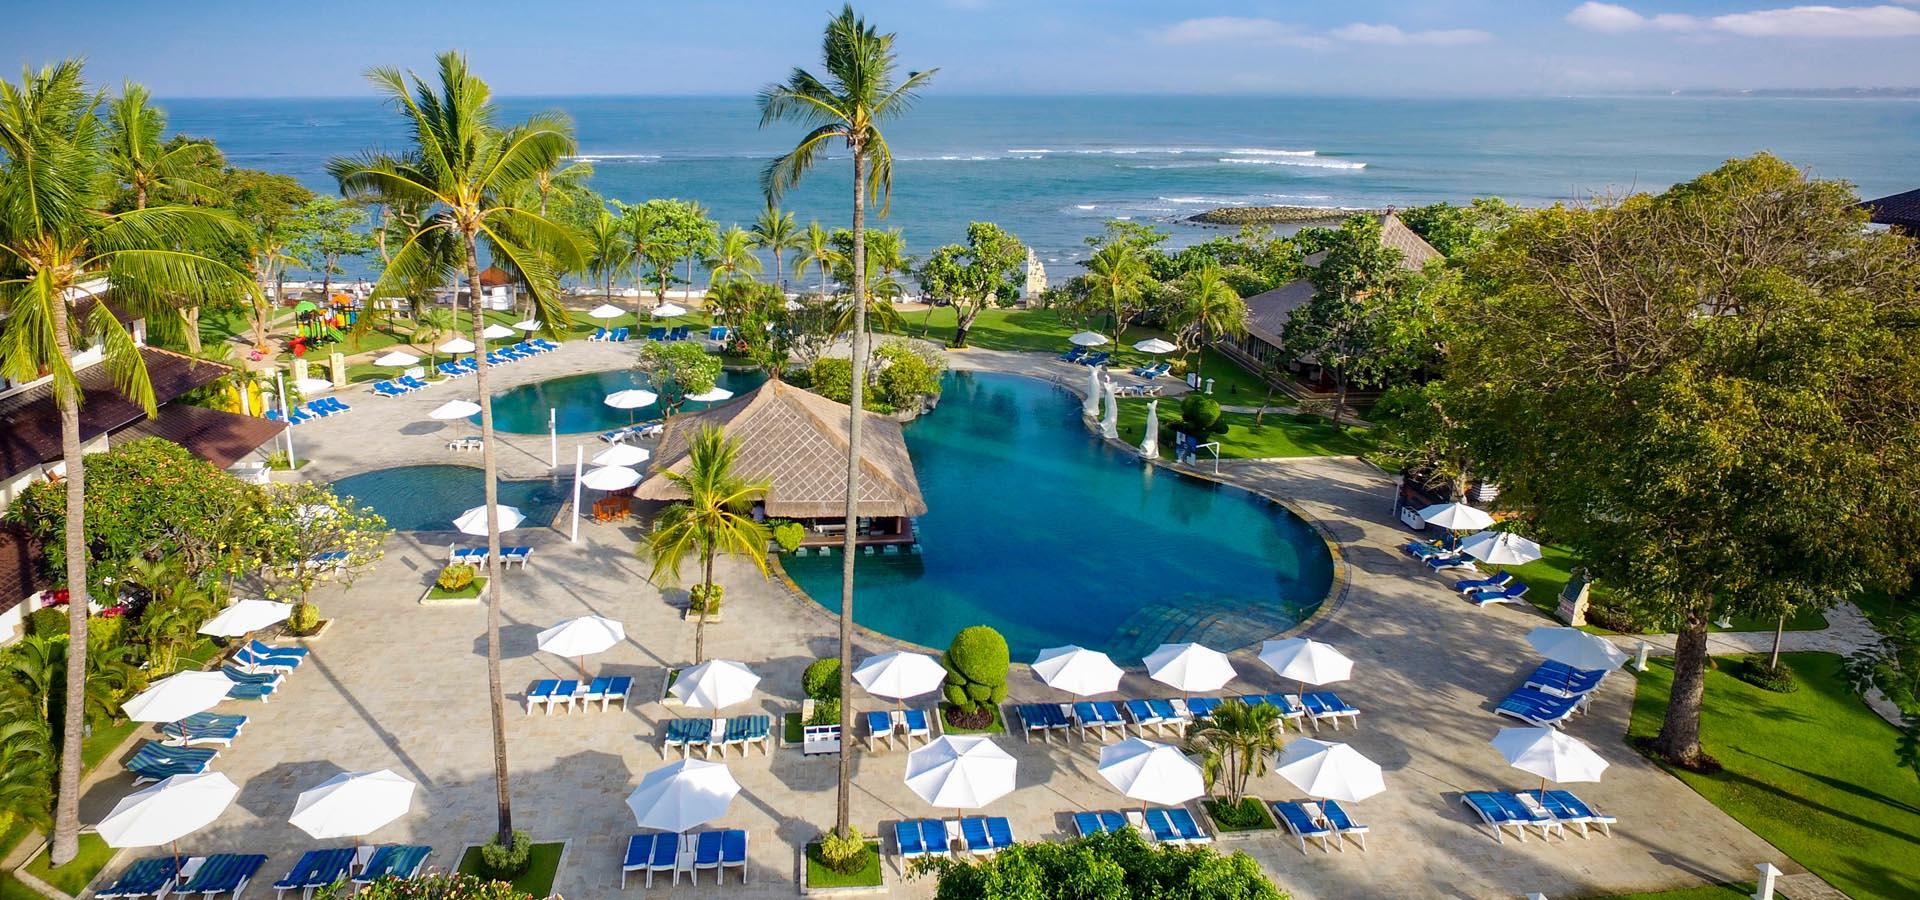 Discovery Kartika Plaza Hotel - Bali